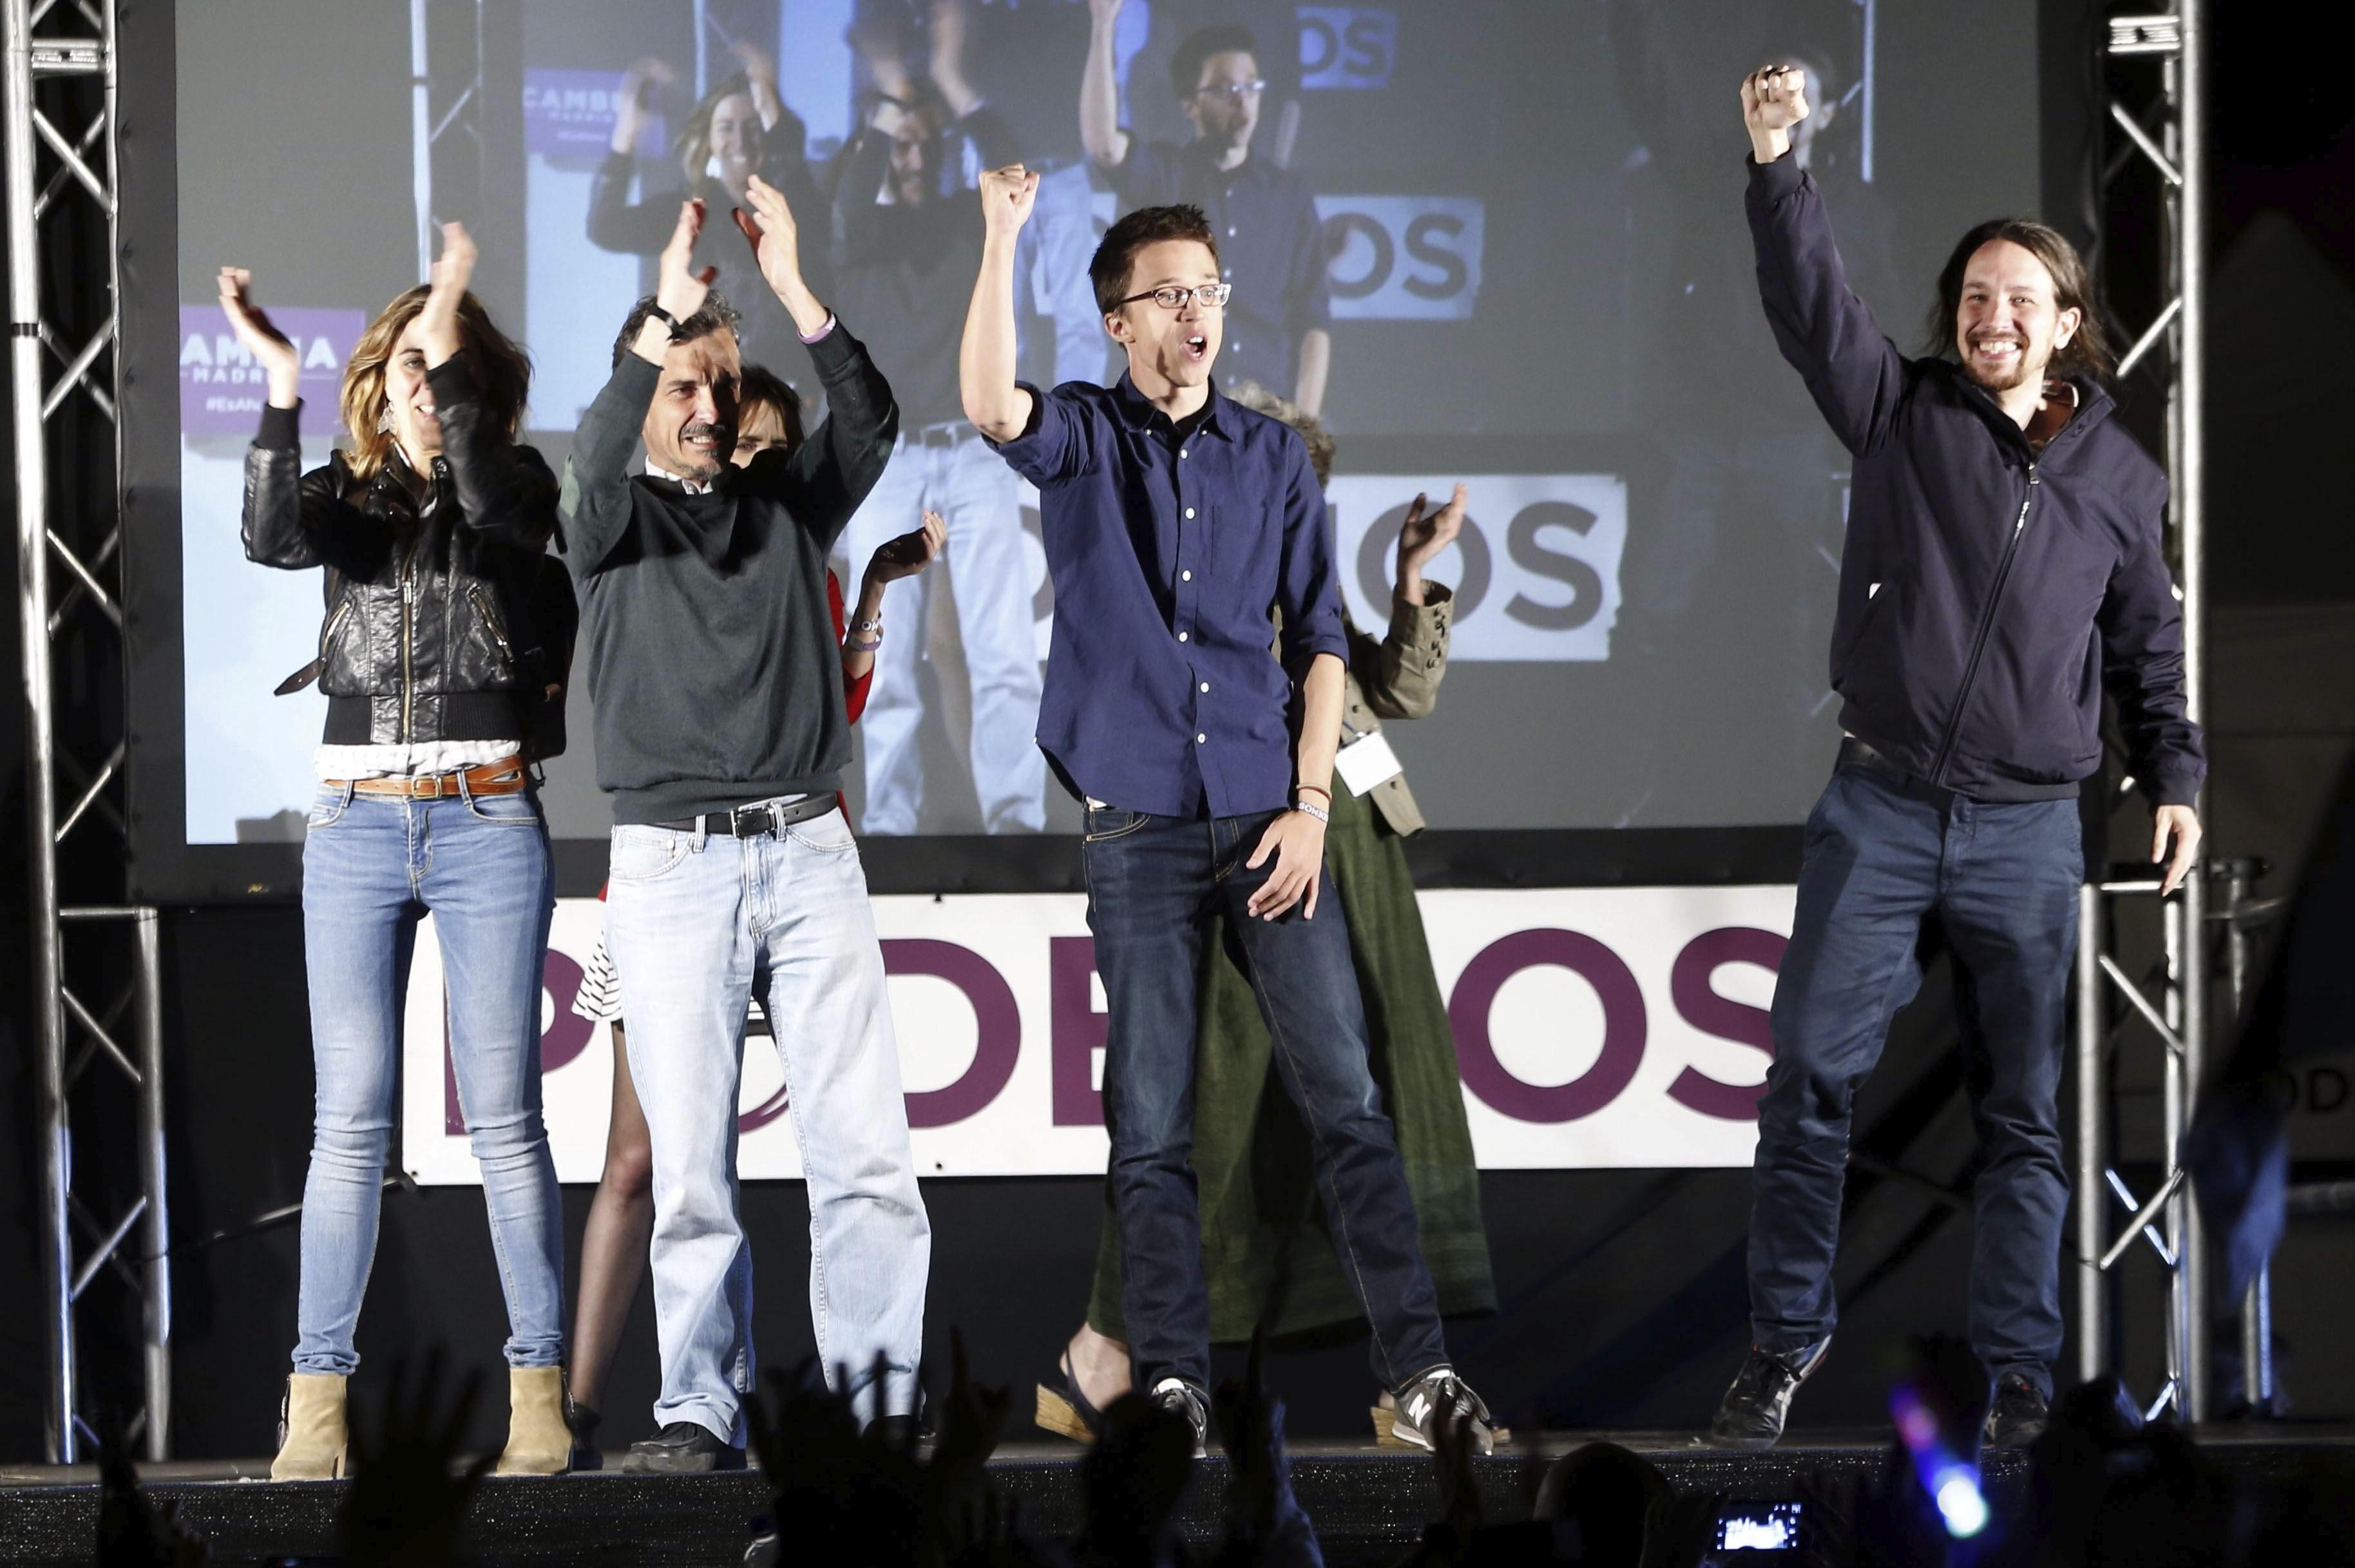 Dirigentes_Podemos_festejan_victoria_Carmena_Efe